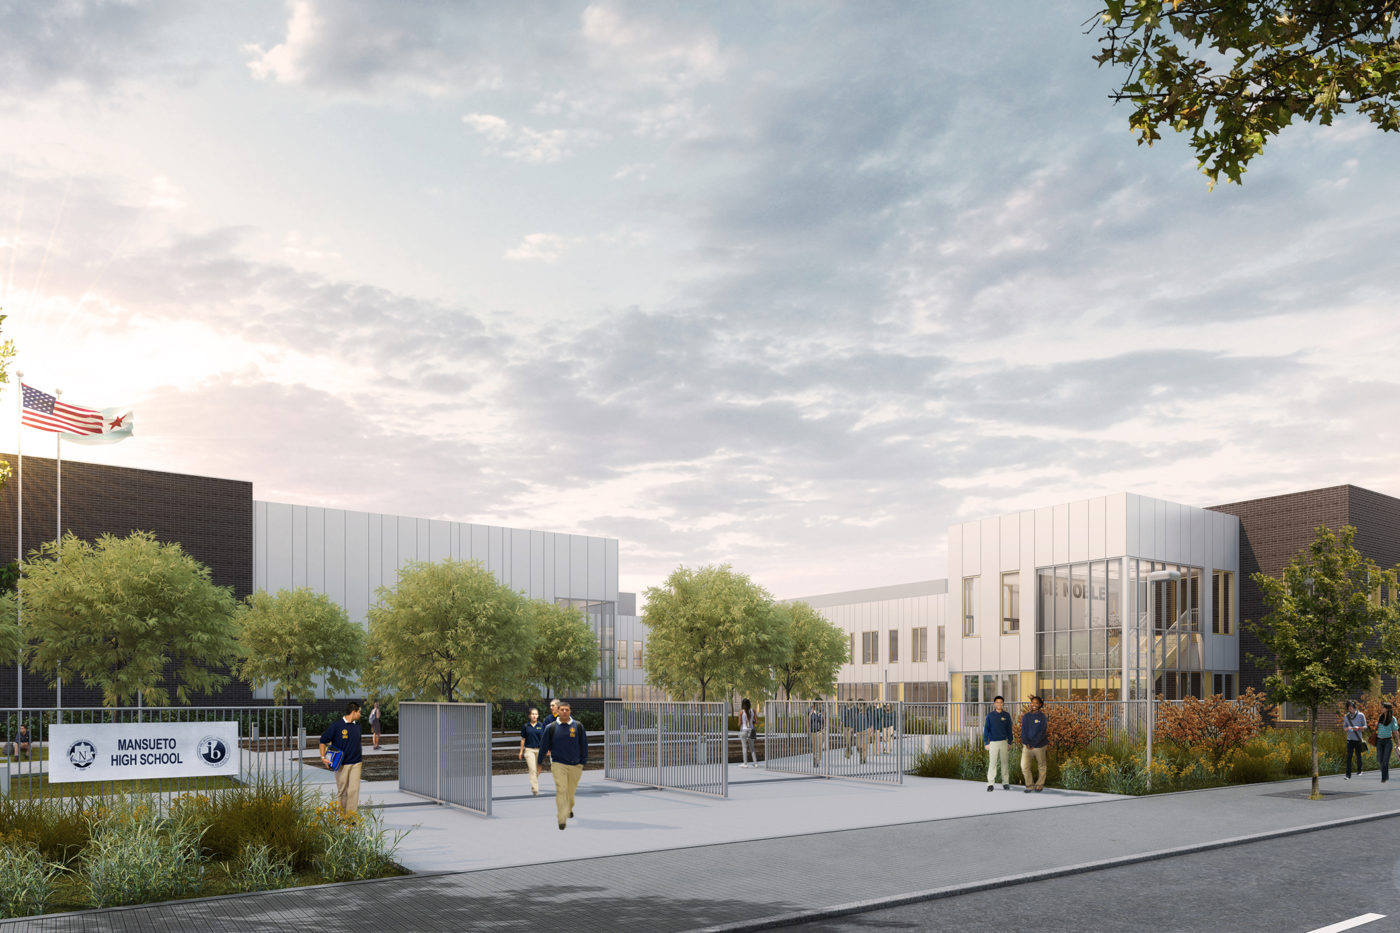 Civil Contractor Mansueto High School Wheeler Kearns Architects